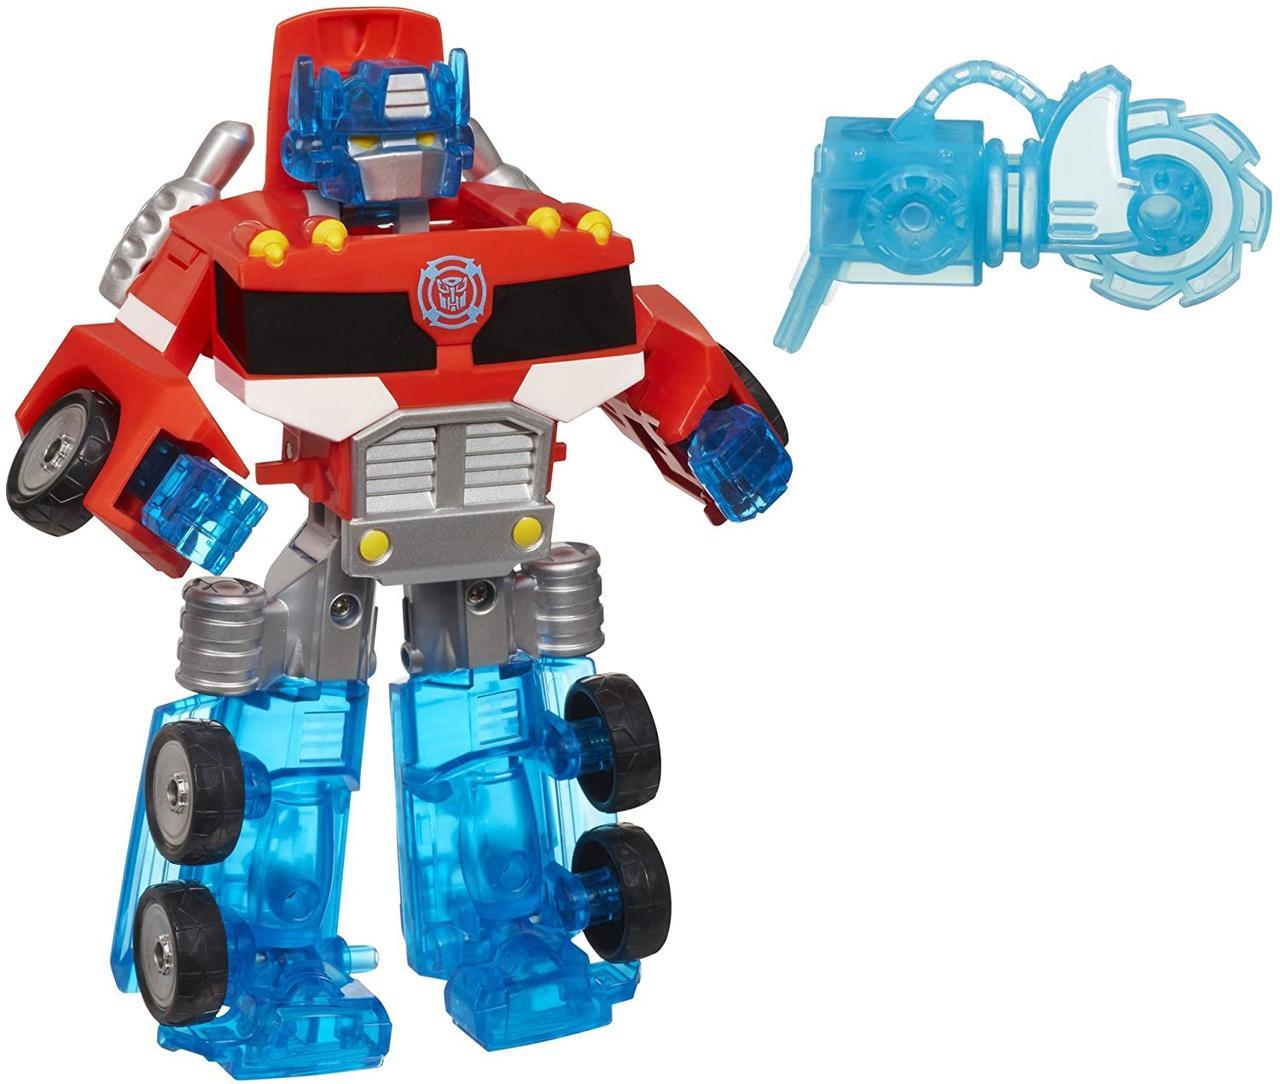 Трансформер Боты Спасатели Оптимус Прайм Playskool Heroes Transformers Rescue Bots Optimus Prime Figur